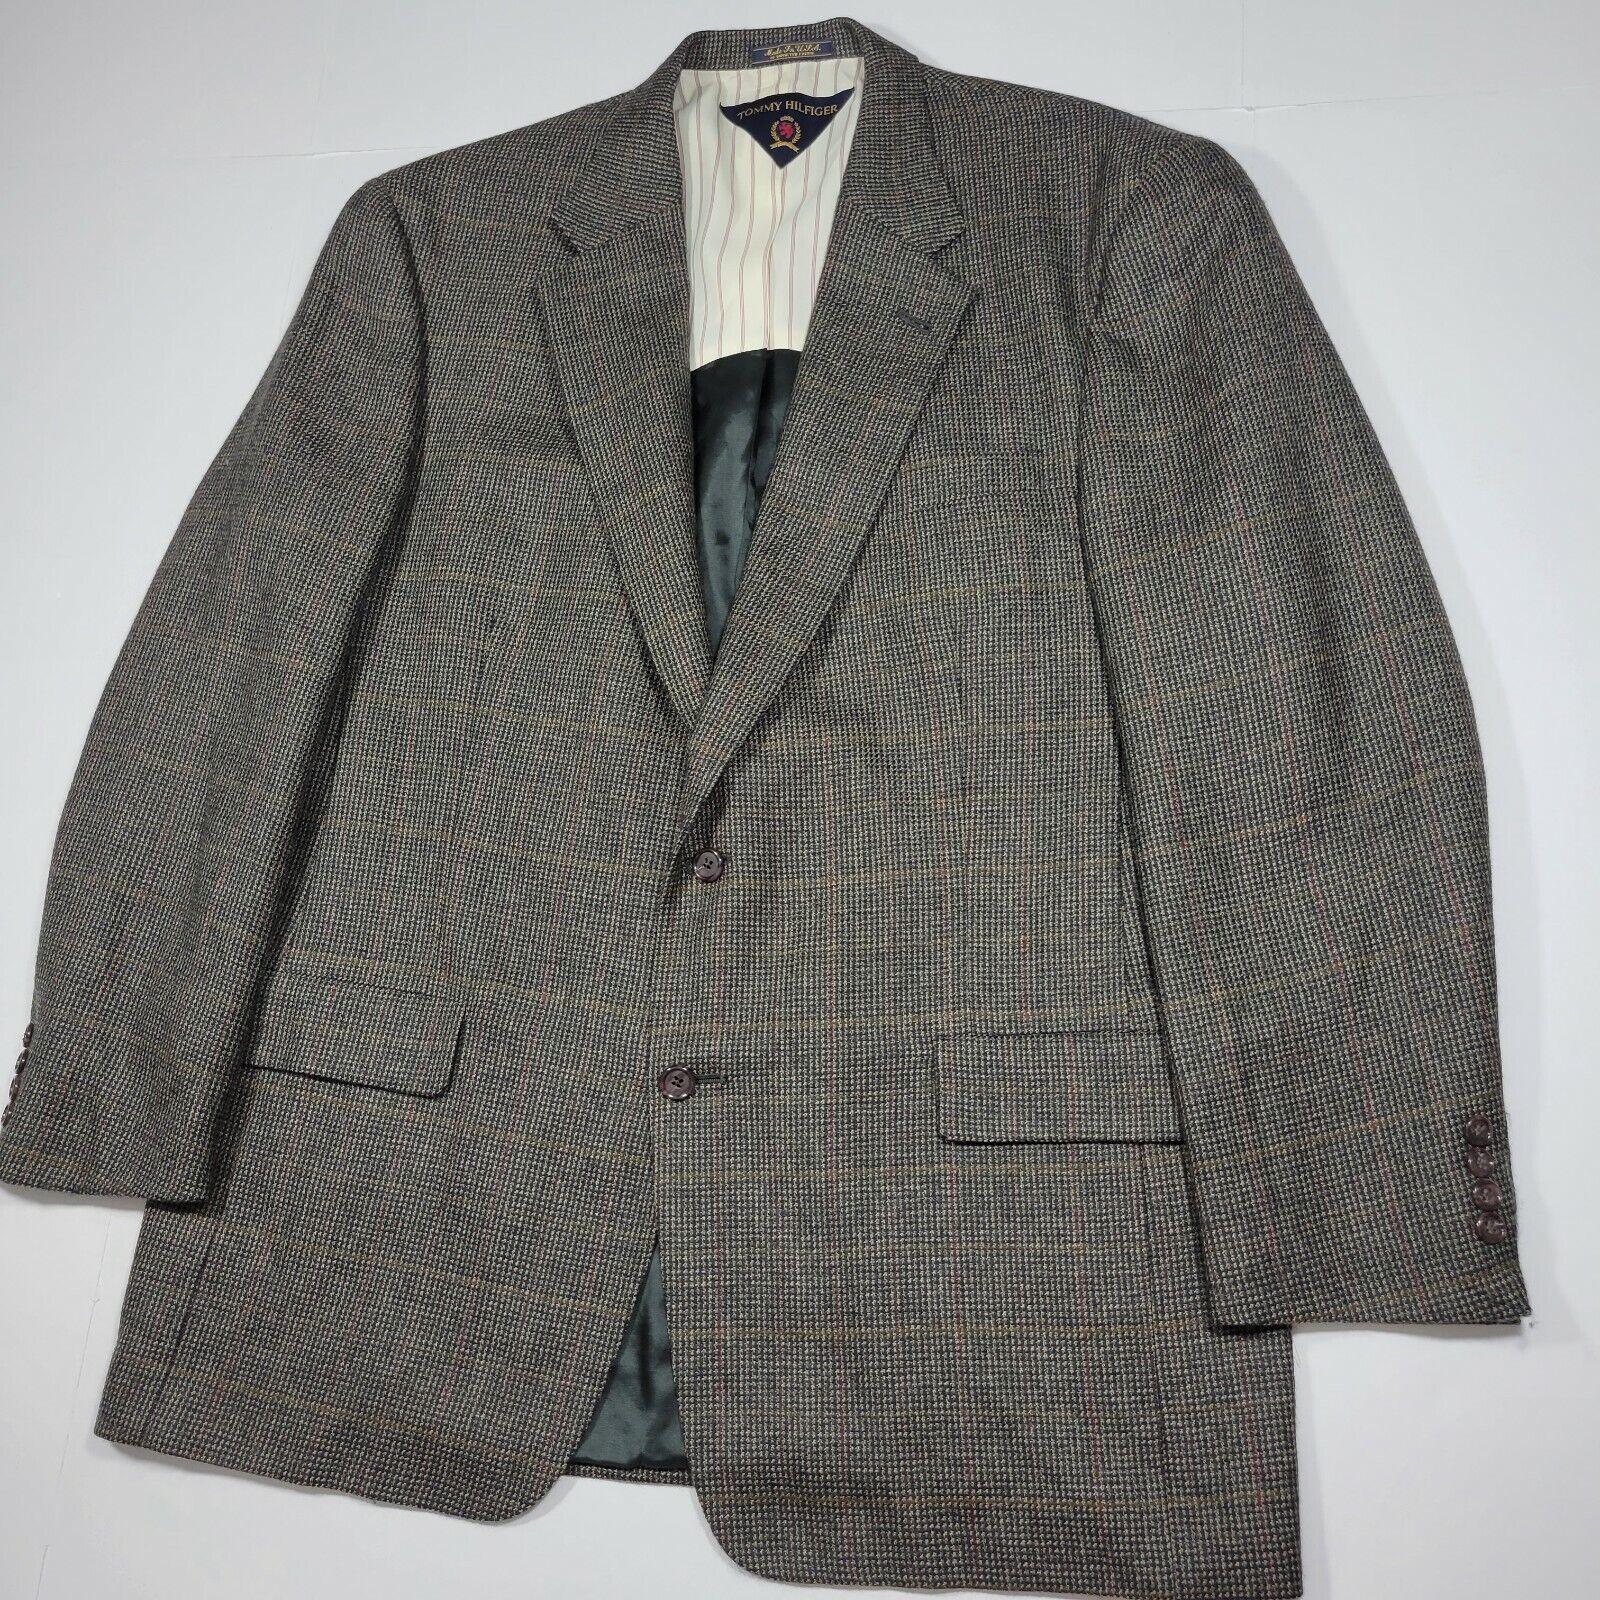 Tommy Hilfiger Sport Coat Blazer - Gray Multi Col… - image 4